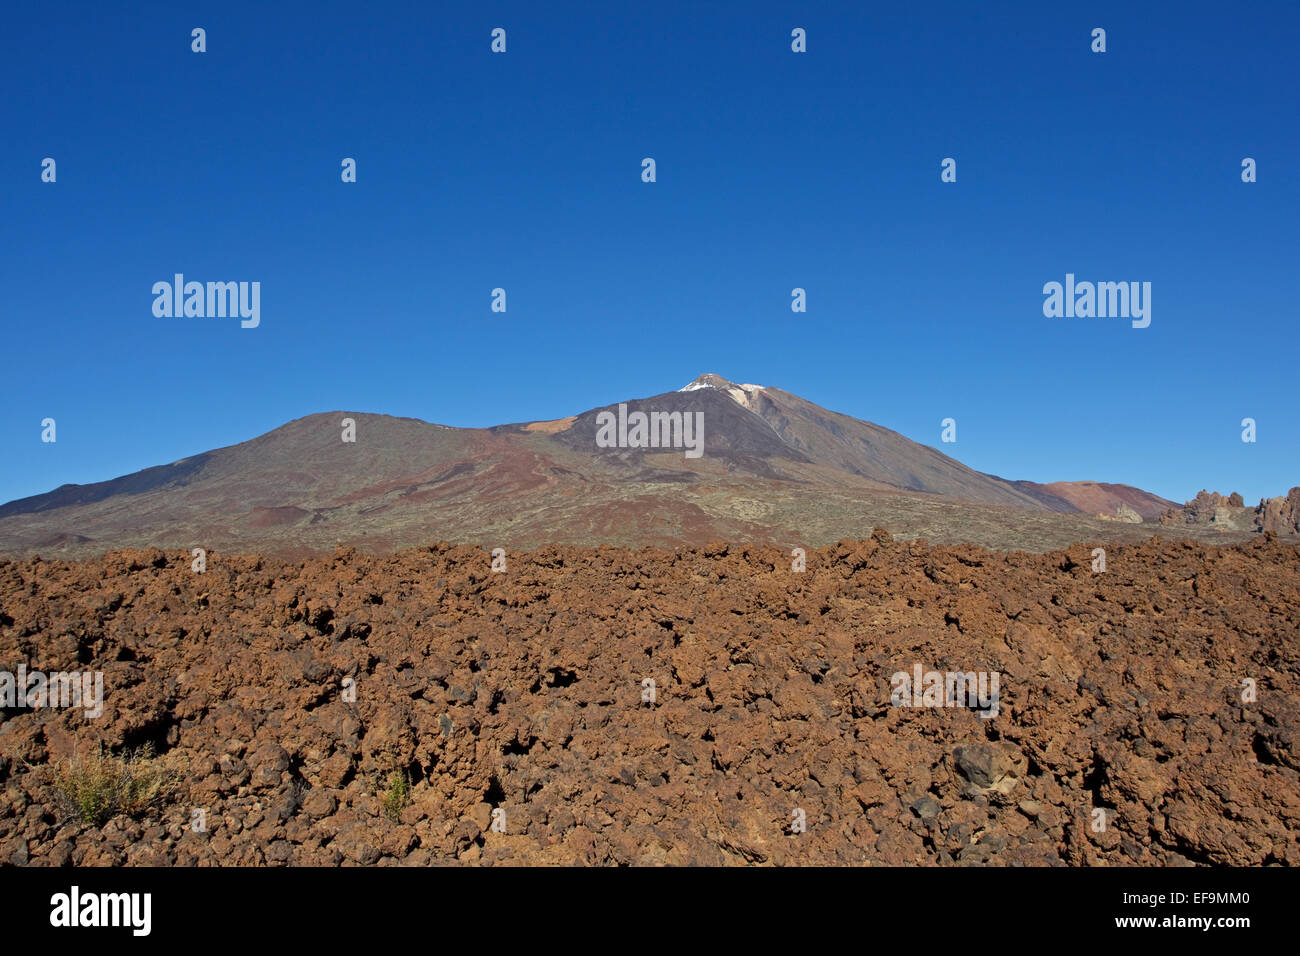 Lava field, Teide and Pico Viejo, Las Cañadas del Teide, Teide National Park, Stock Photo